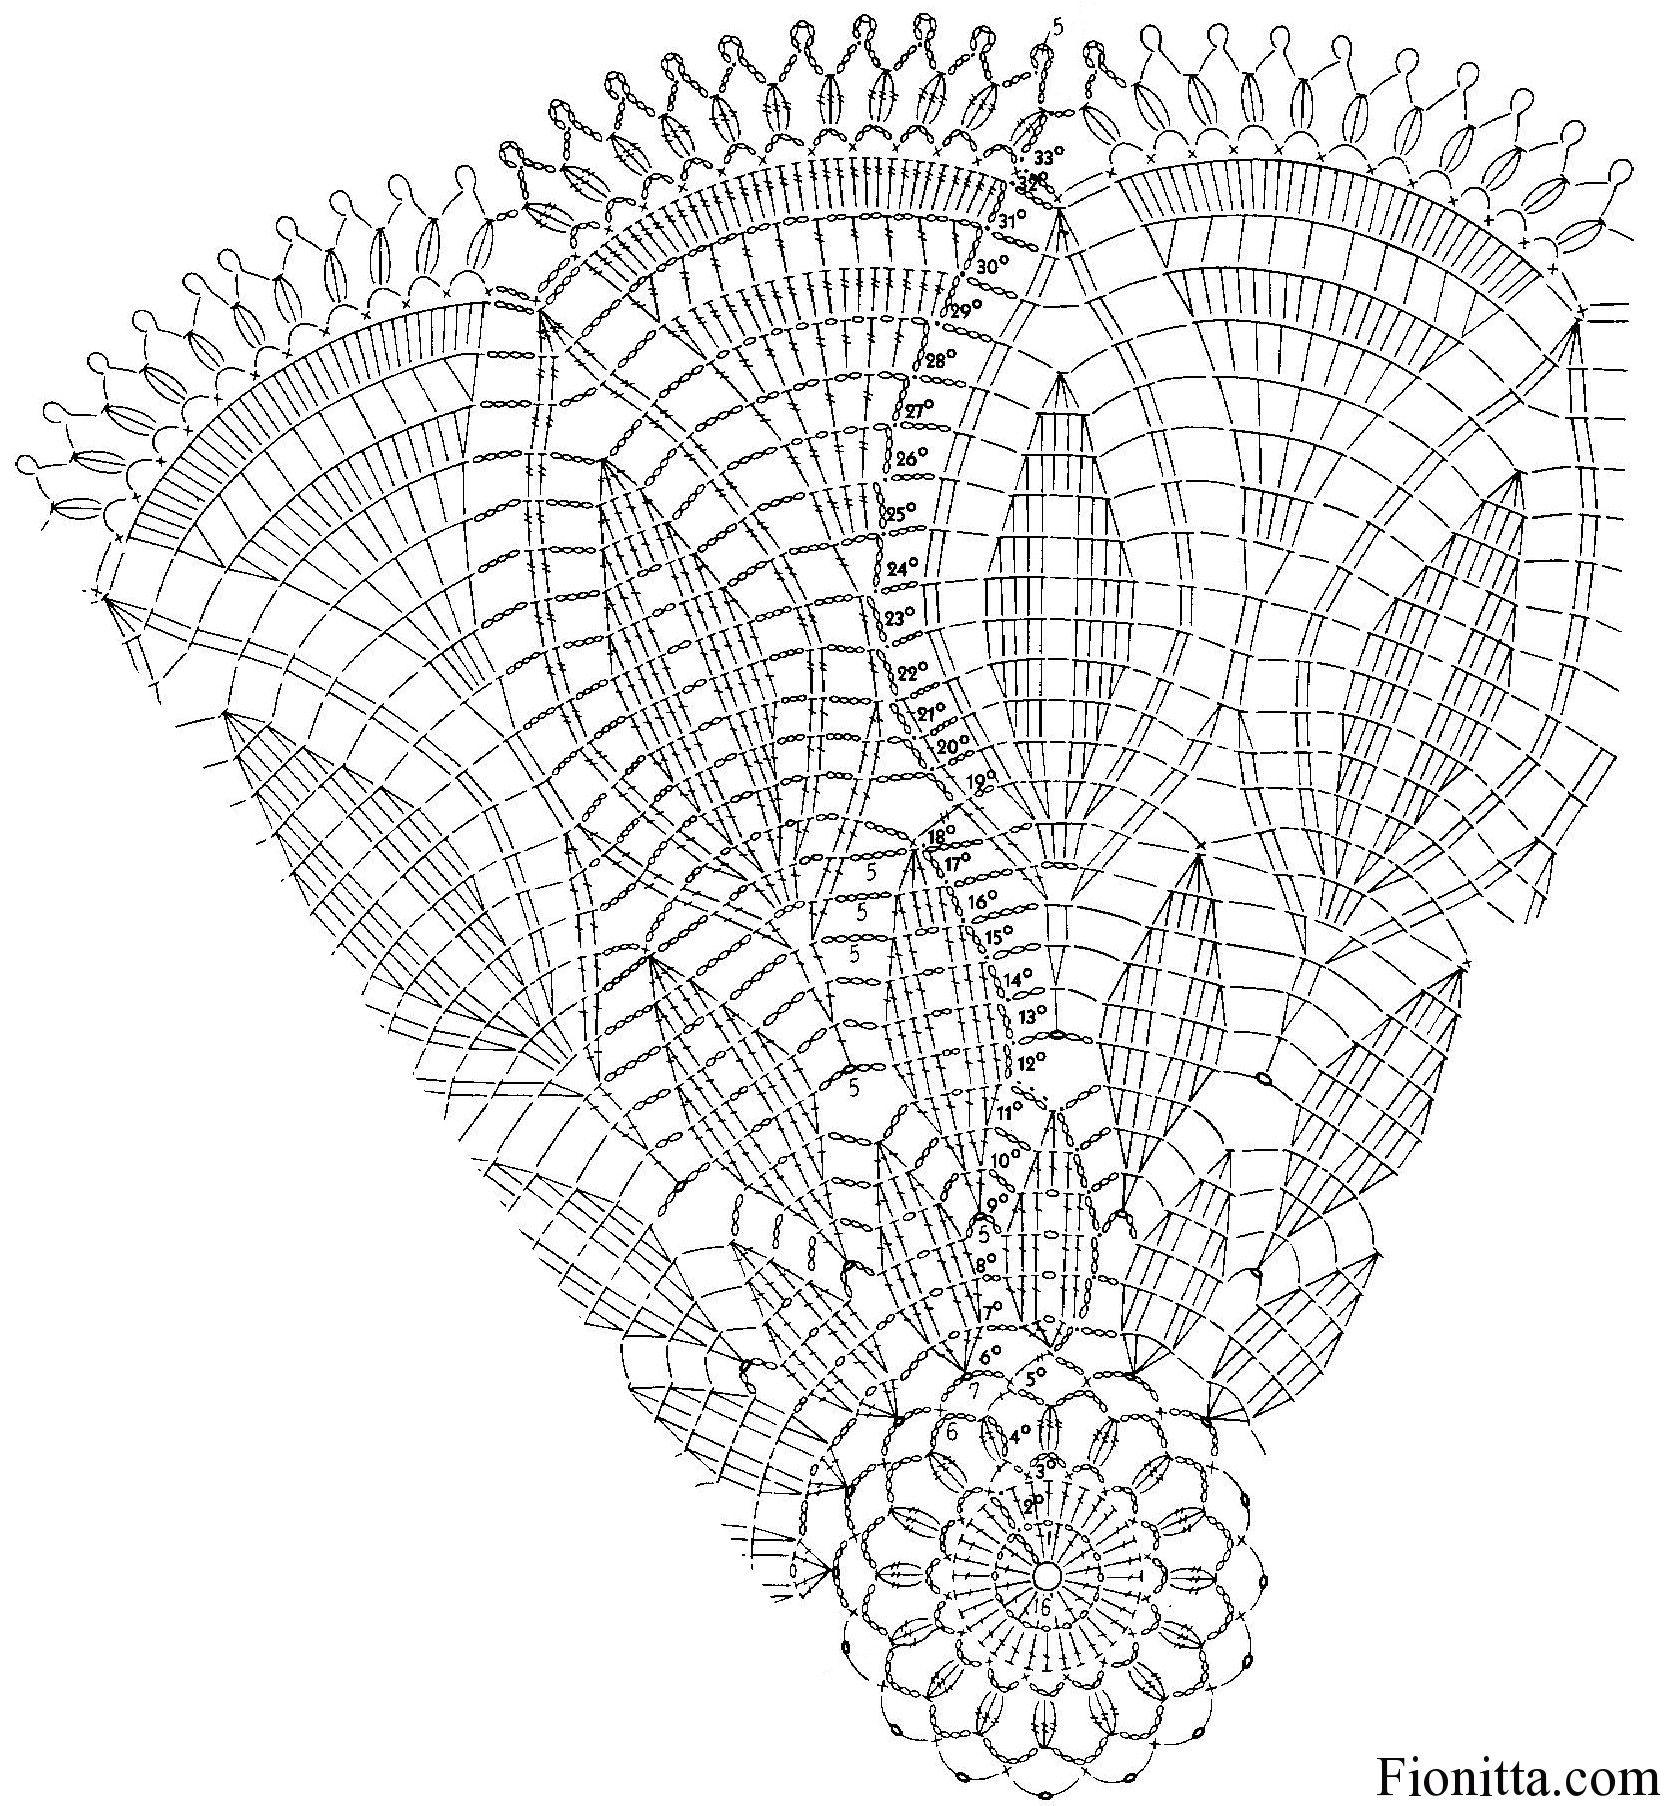 Claret Elegant Doily Fionitta Crochet Doily Patterns Crochet Doilies Crochet Doily Patterns